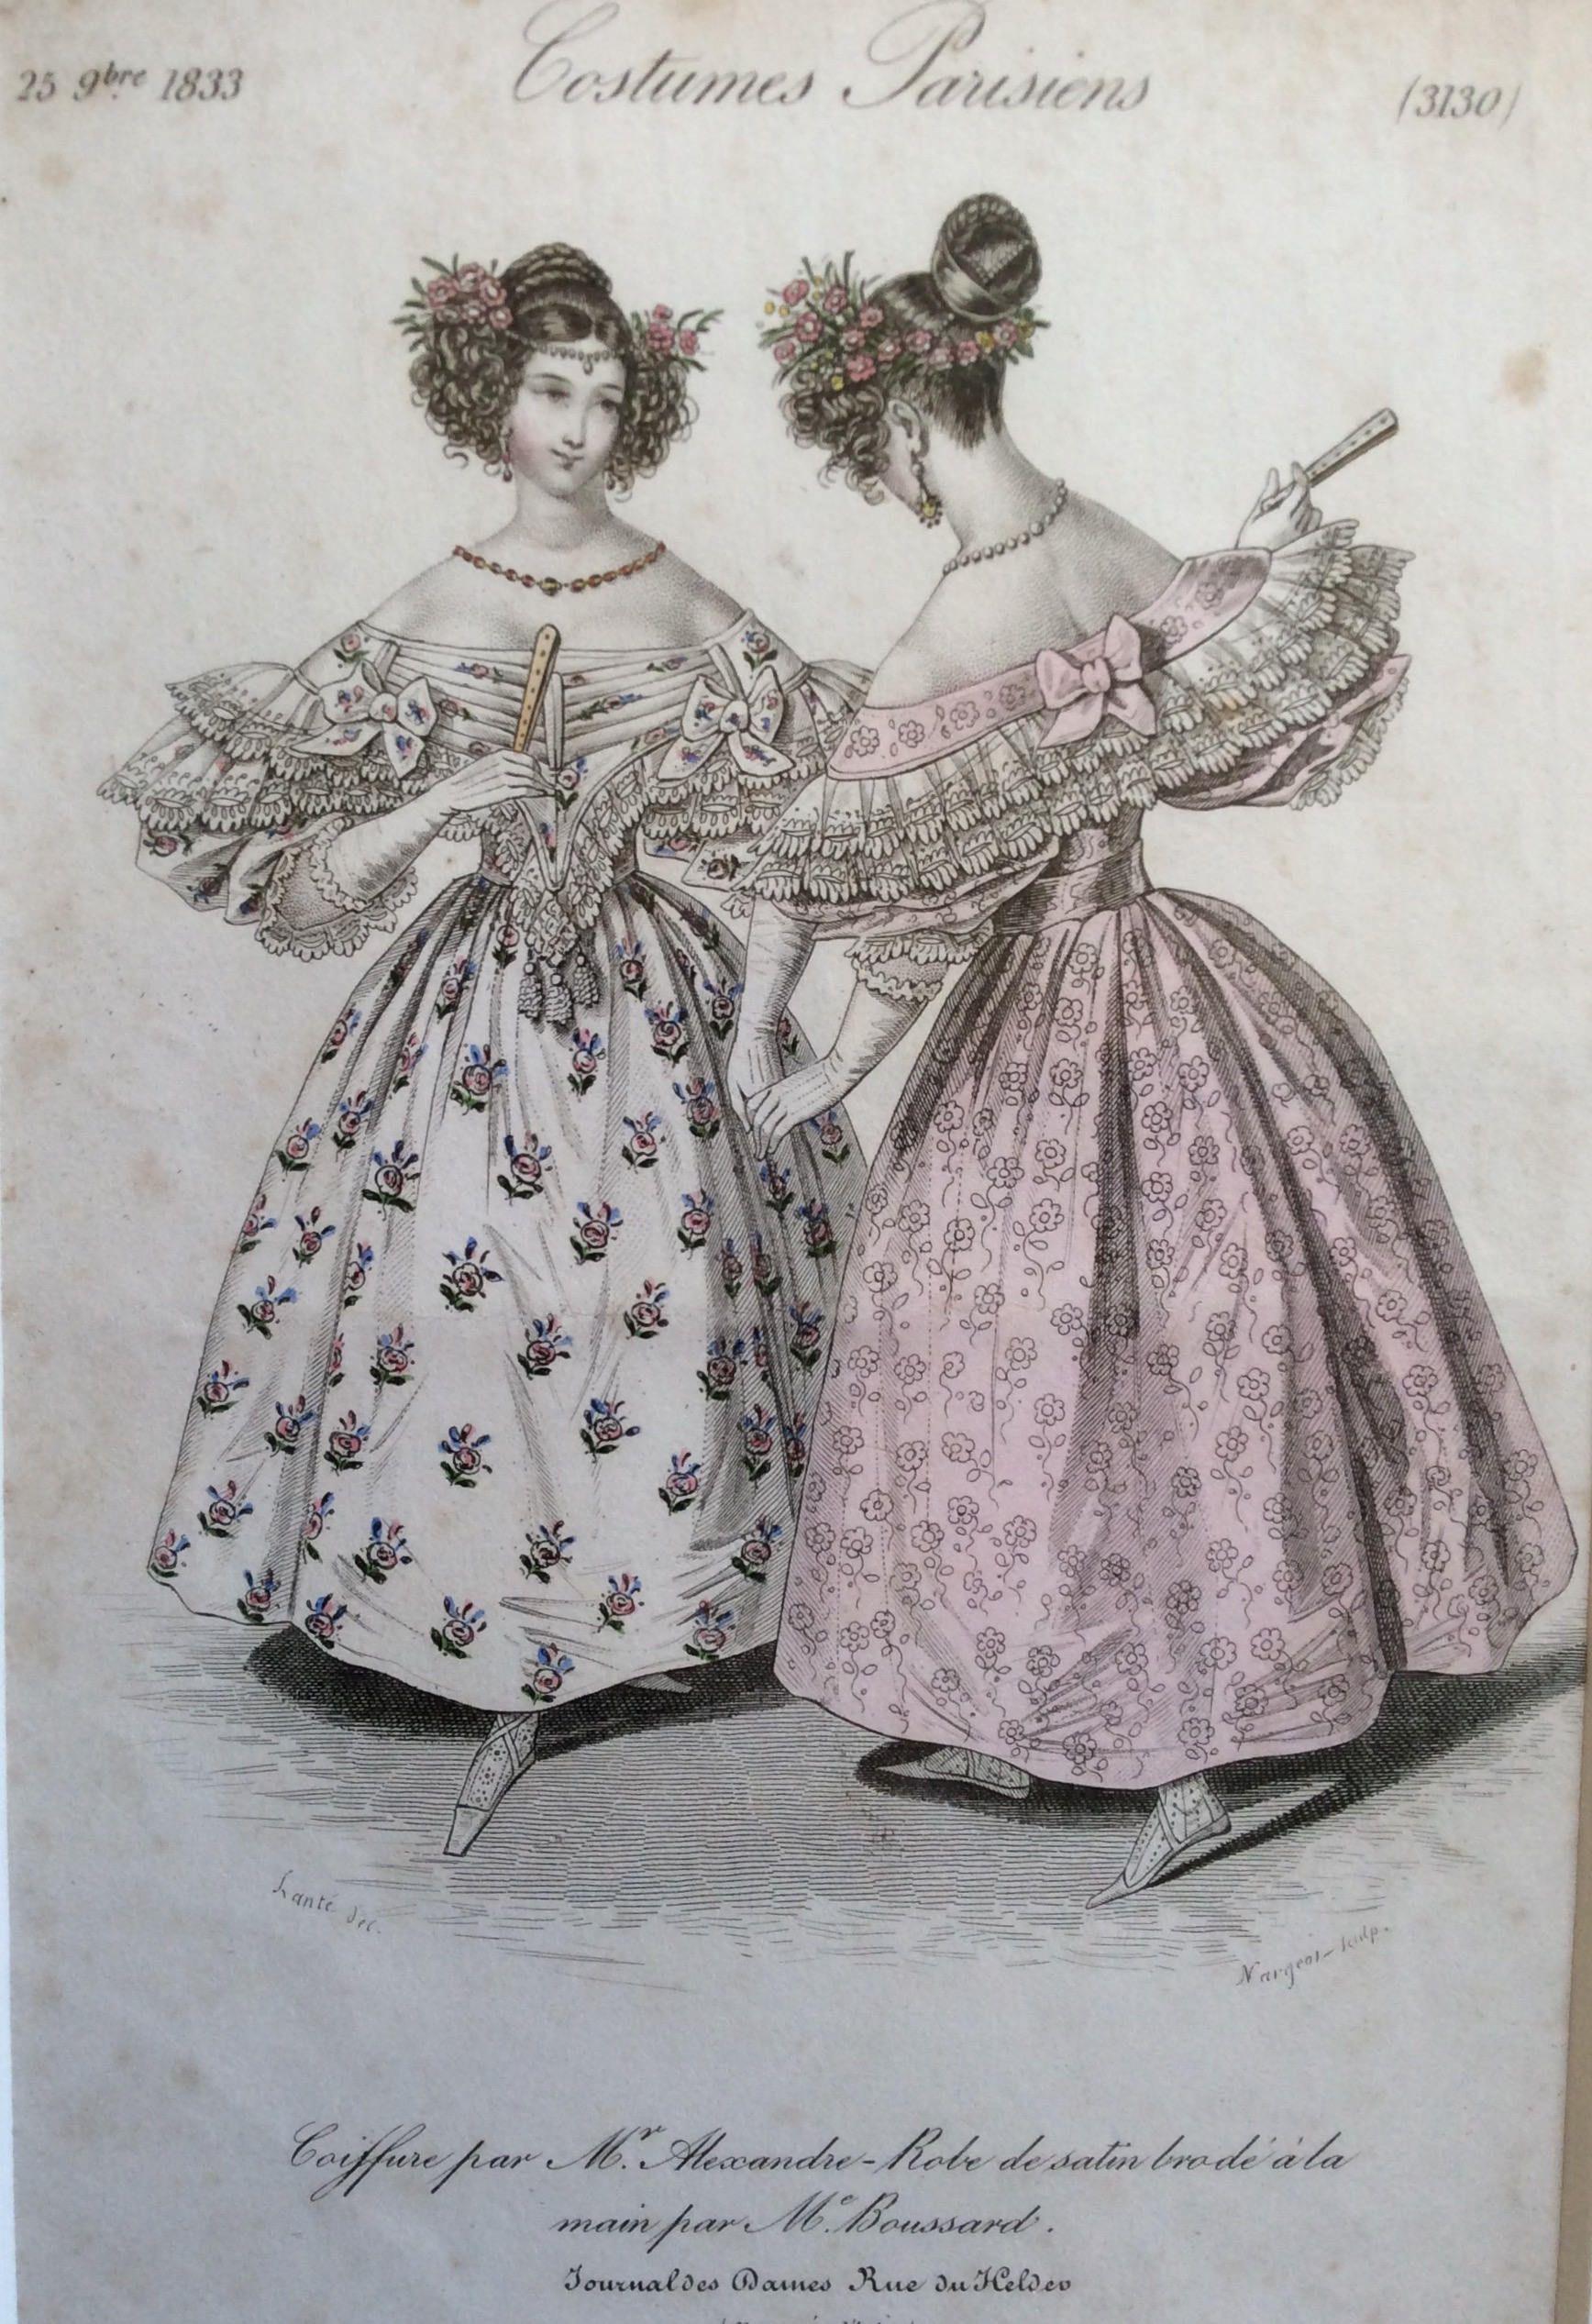 Antique Fashion Prints 19th Century Victorian 1823 Costumes Etsy Fashion Prints 19th Century Fashion Prints